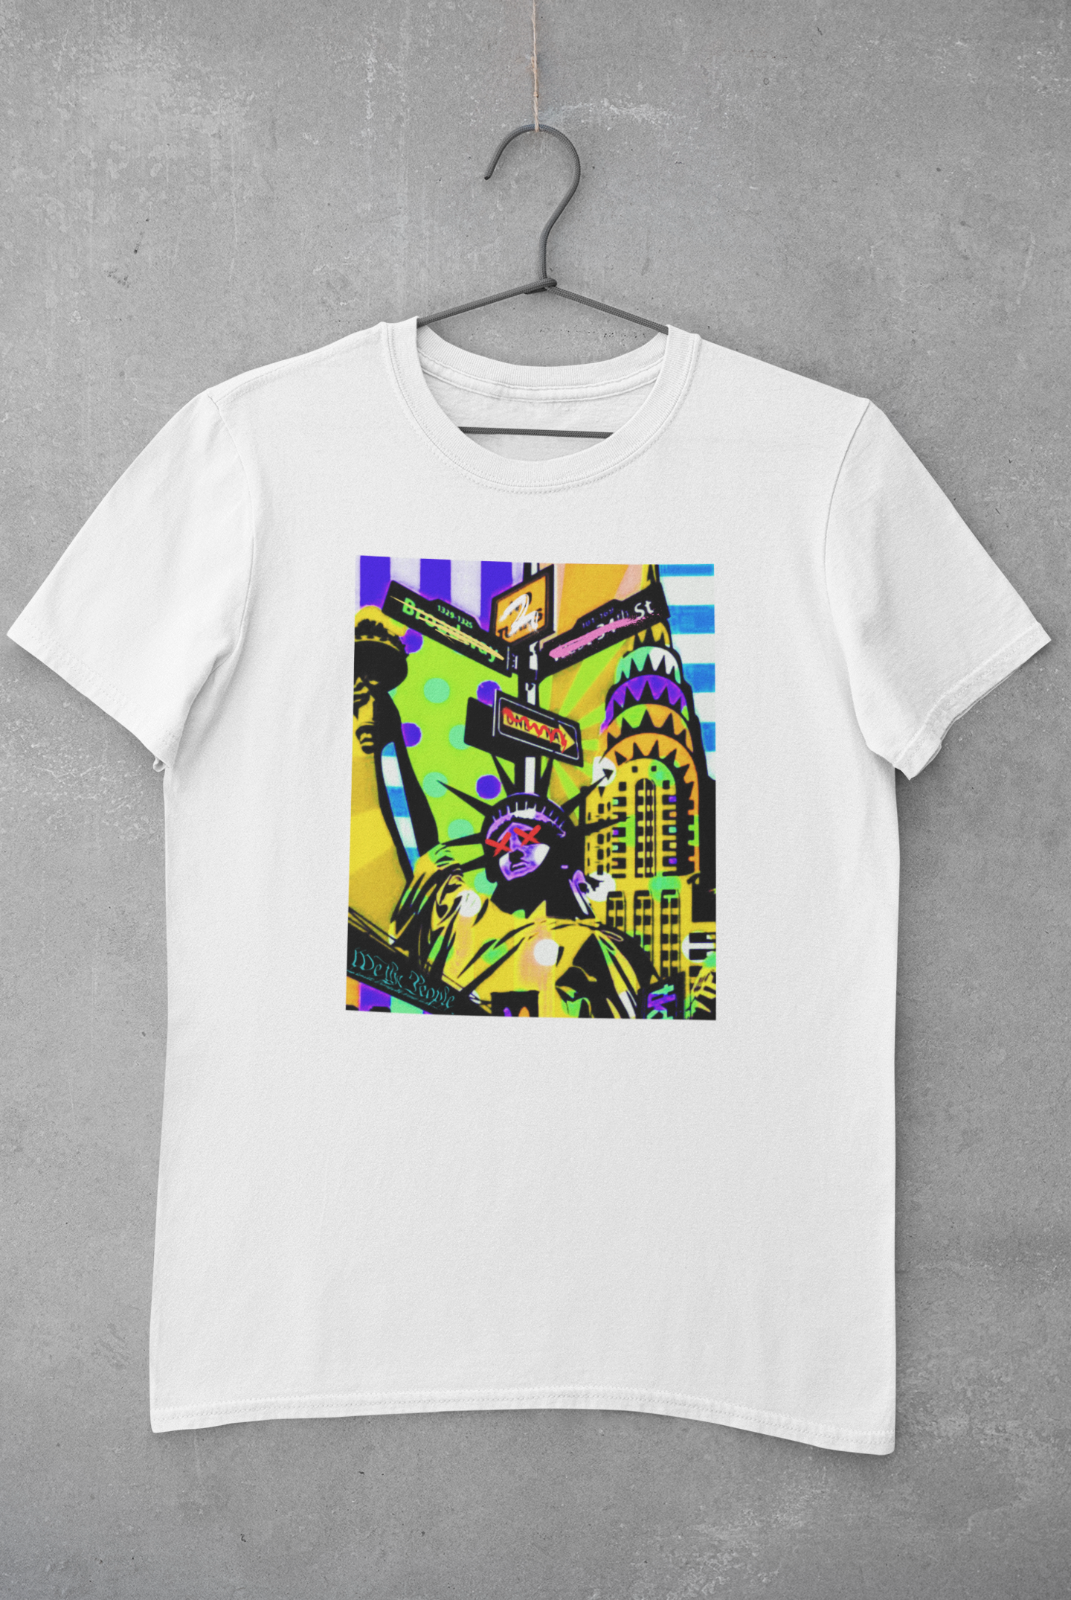 NYC Liberty T-Shirt | New York Graphic Design Tee | Ships Free